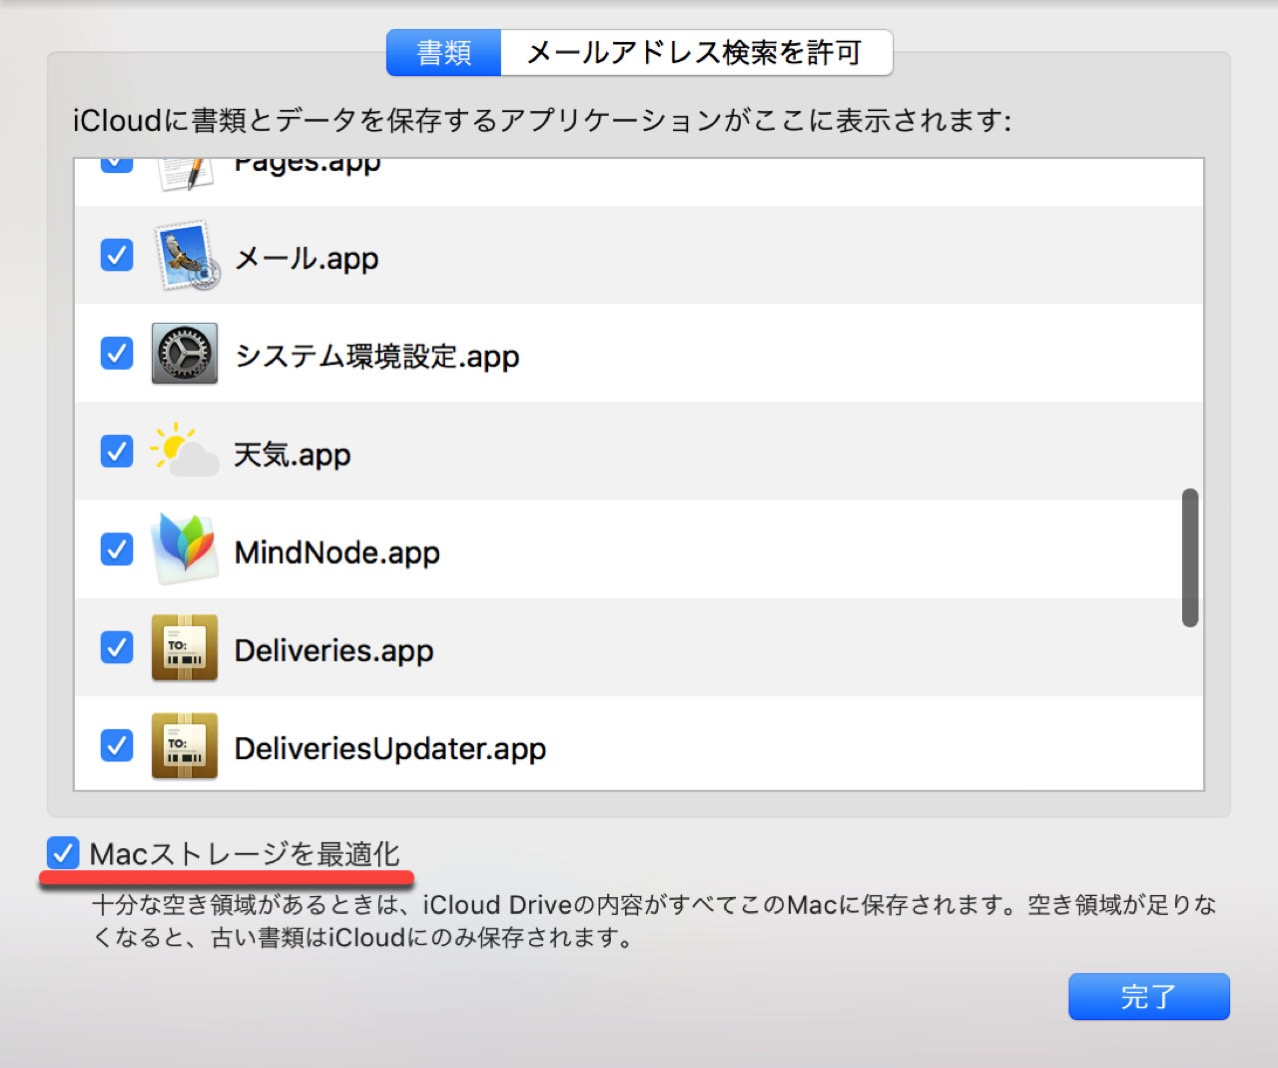 Optimized storage4